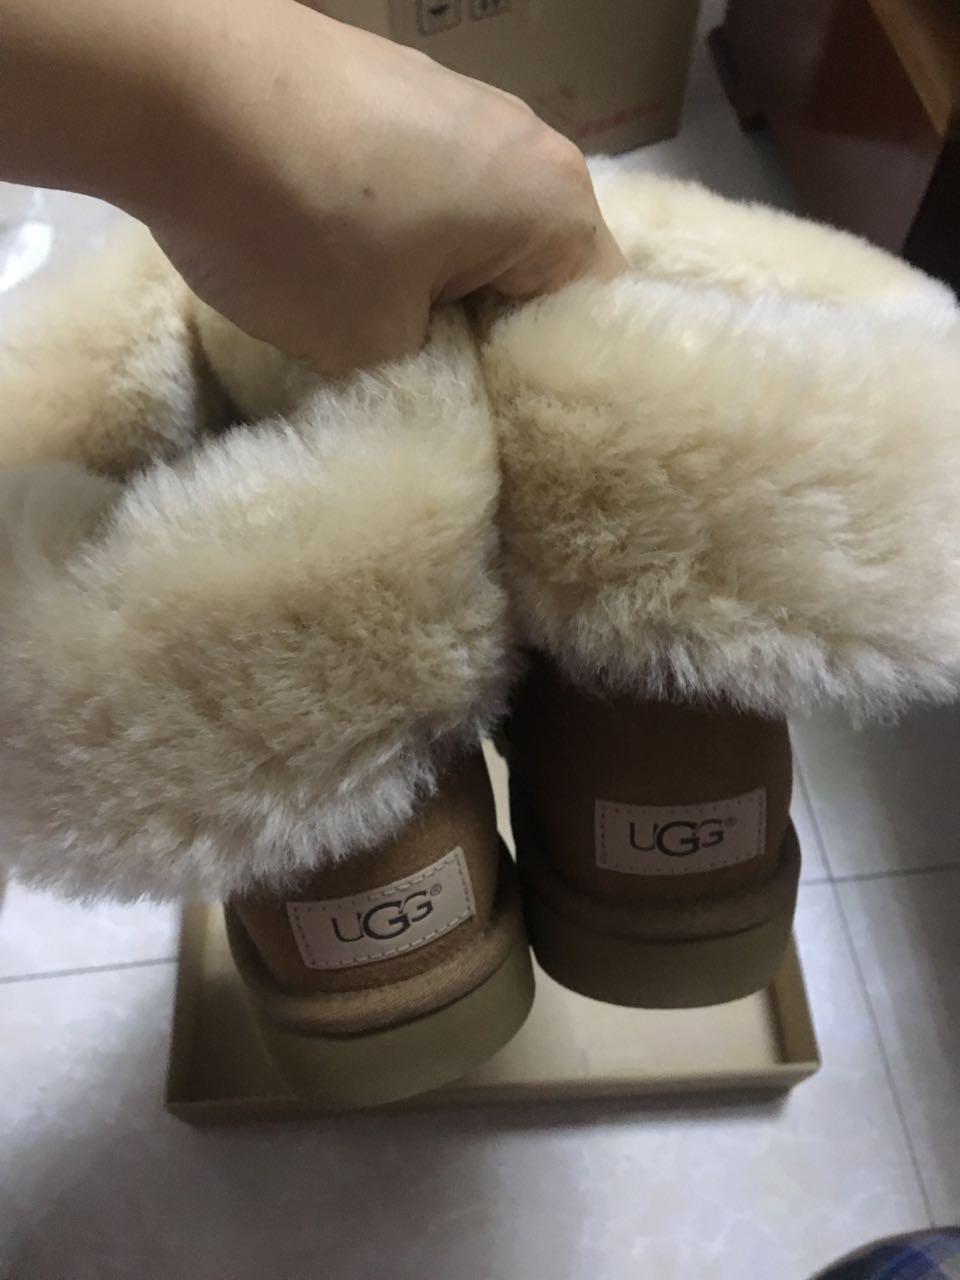 mexico 66 tiger shoes reviews 00242868 wholesale